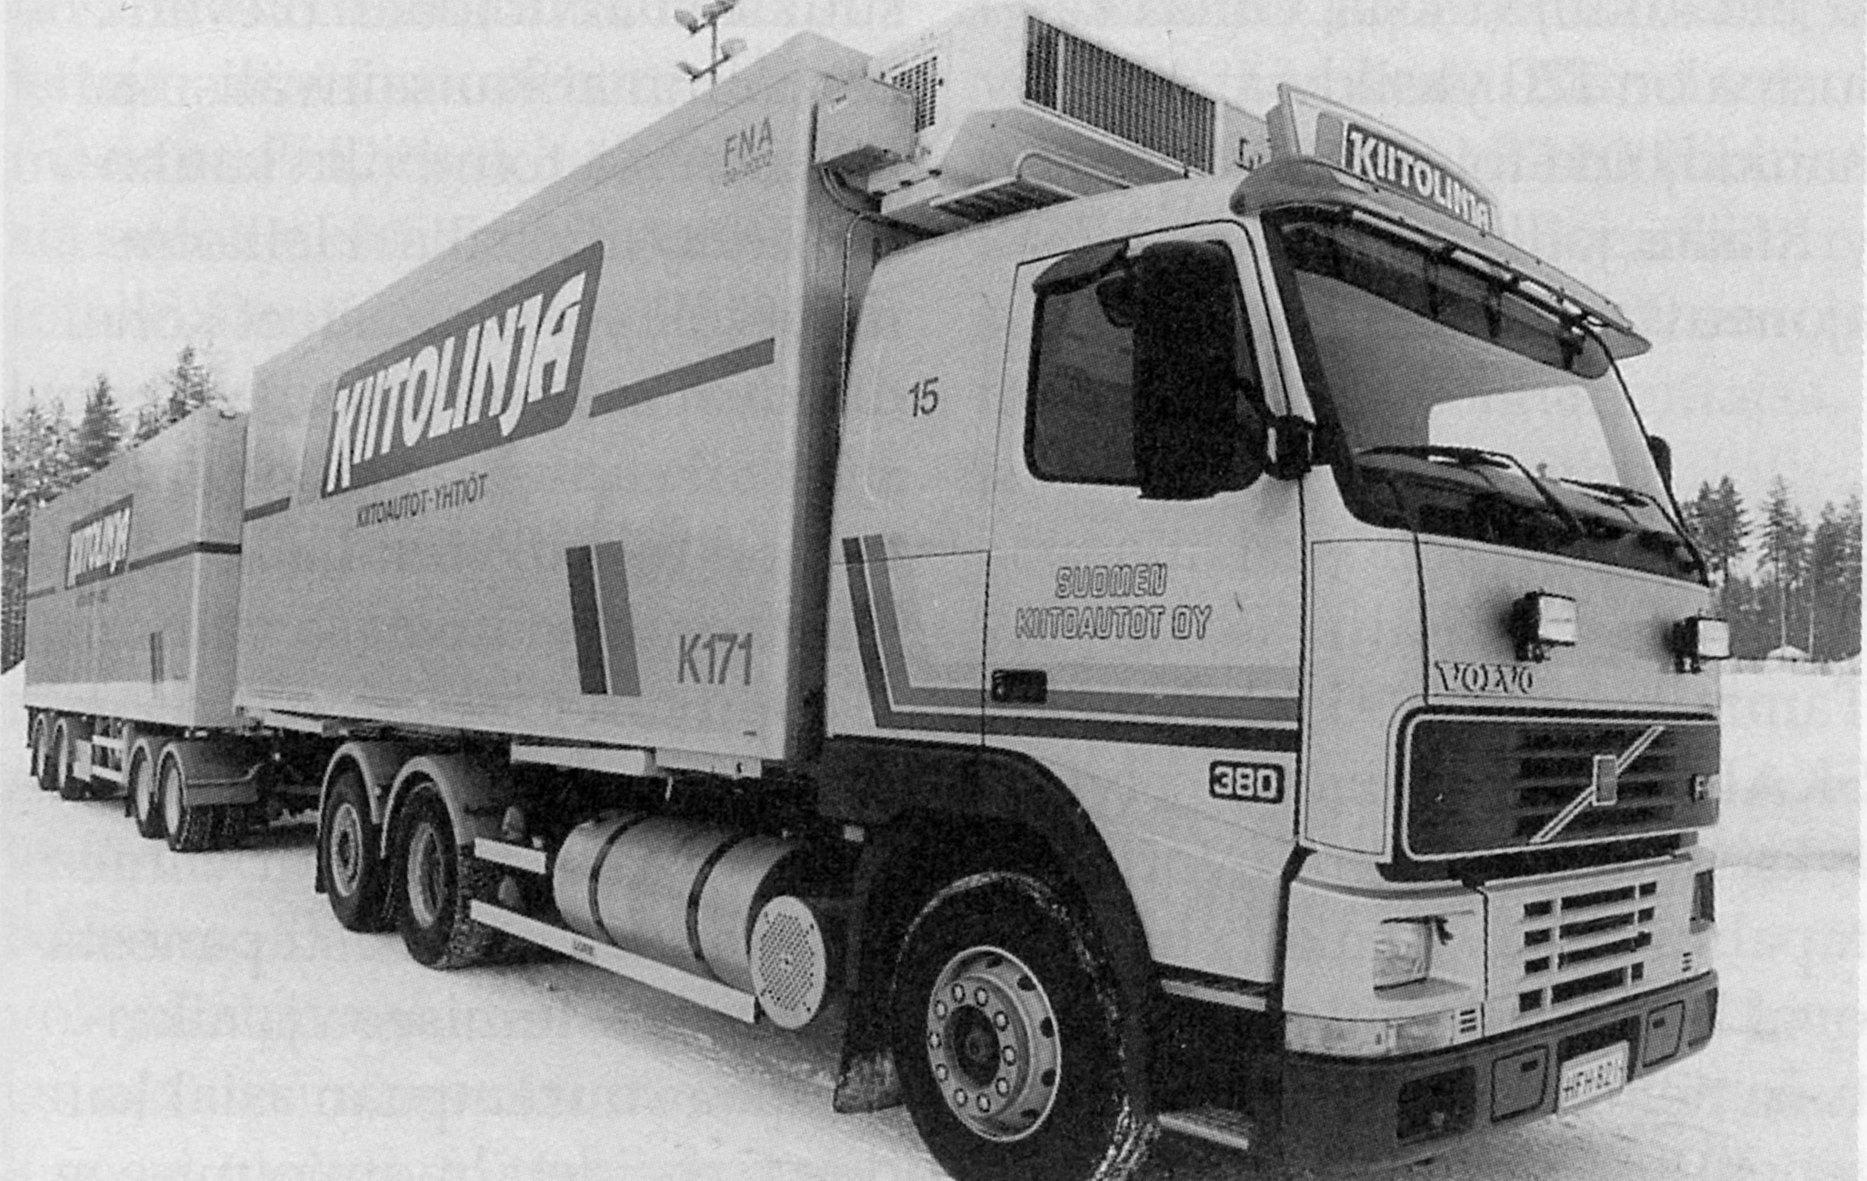 kiitolinja-volvo-380-finland